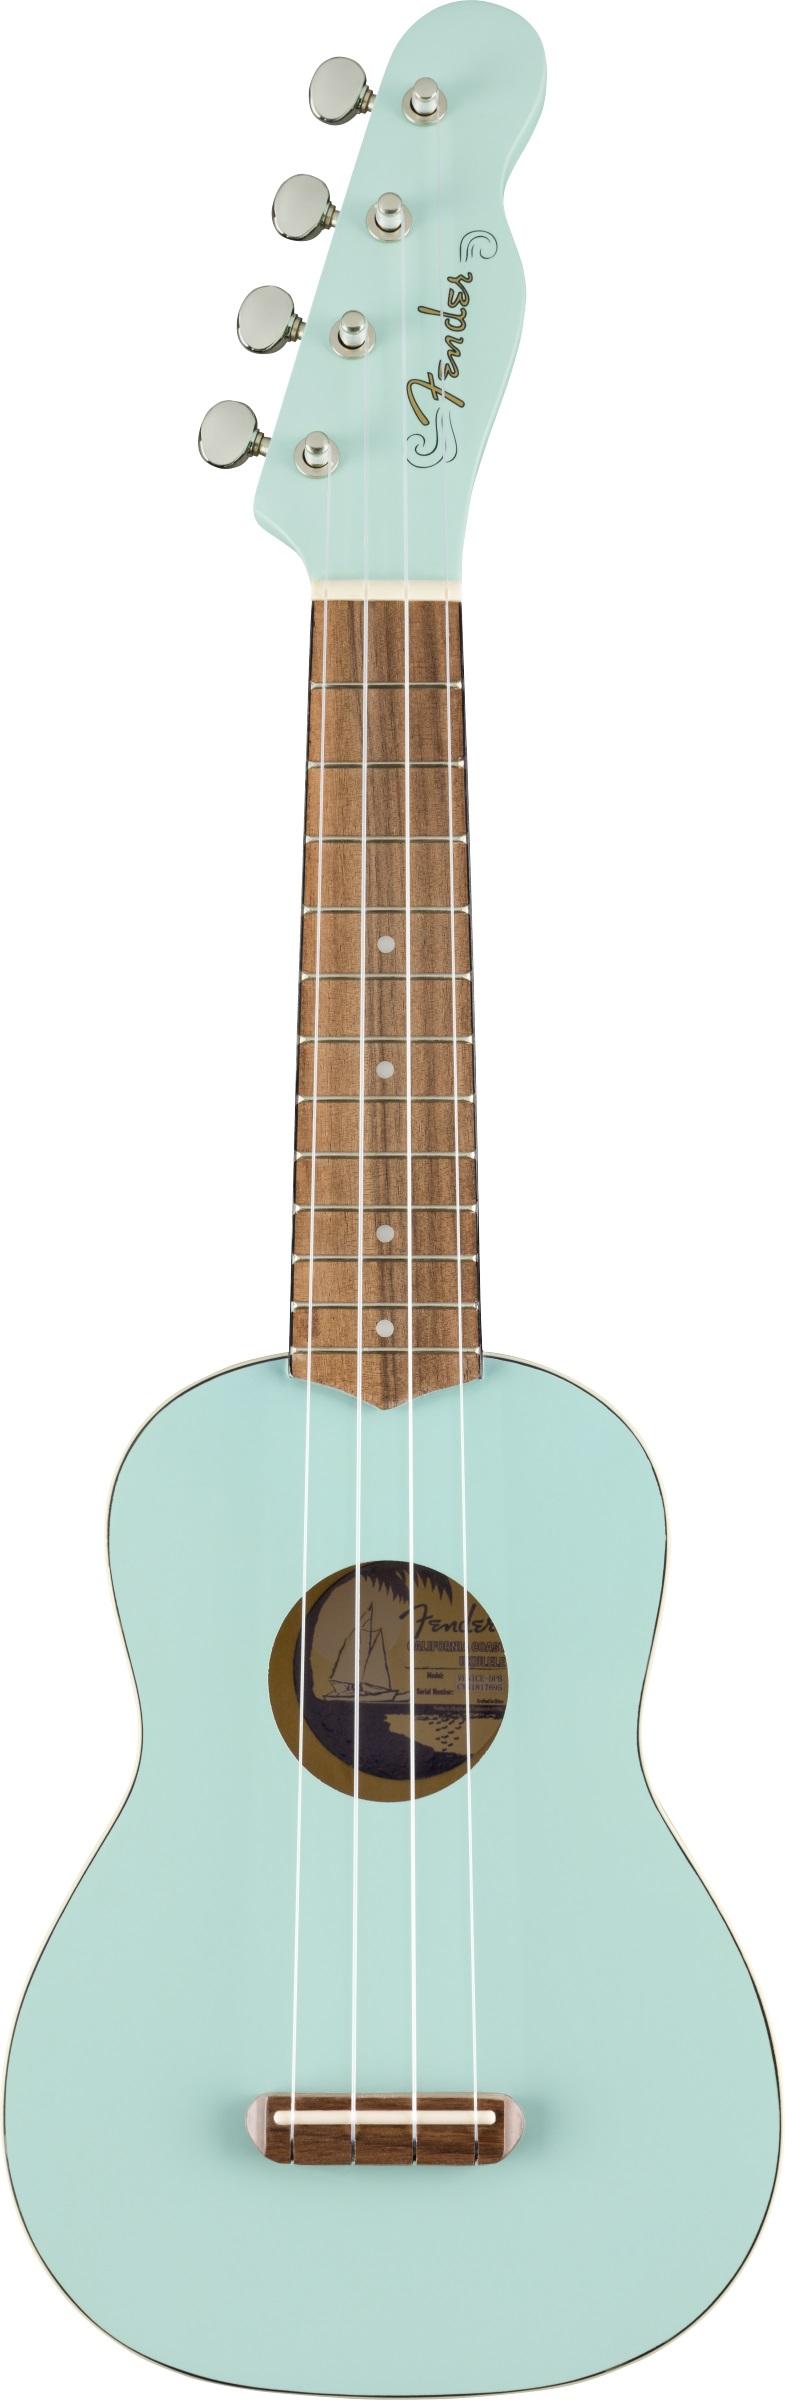 Fender - Venice Sopran Ukulele Daphne Blue - Gitarren - Ukulelen | MUSIK BERTRAM Deutschland Freiburg